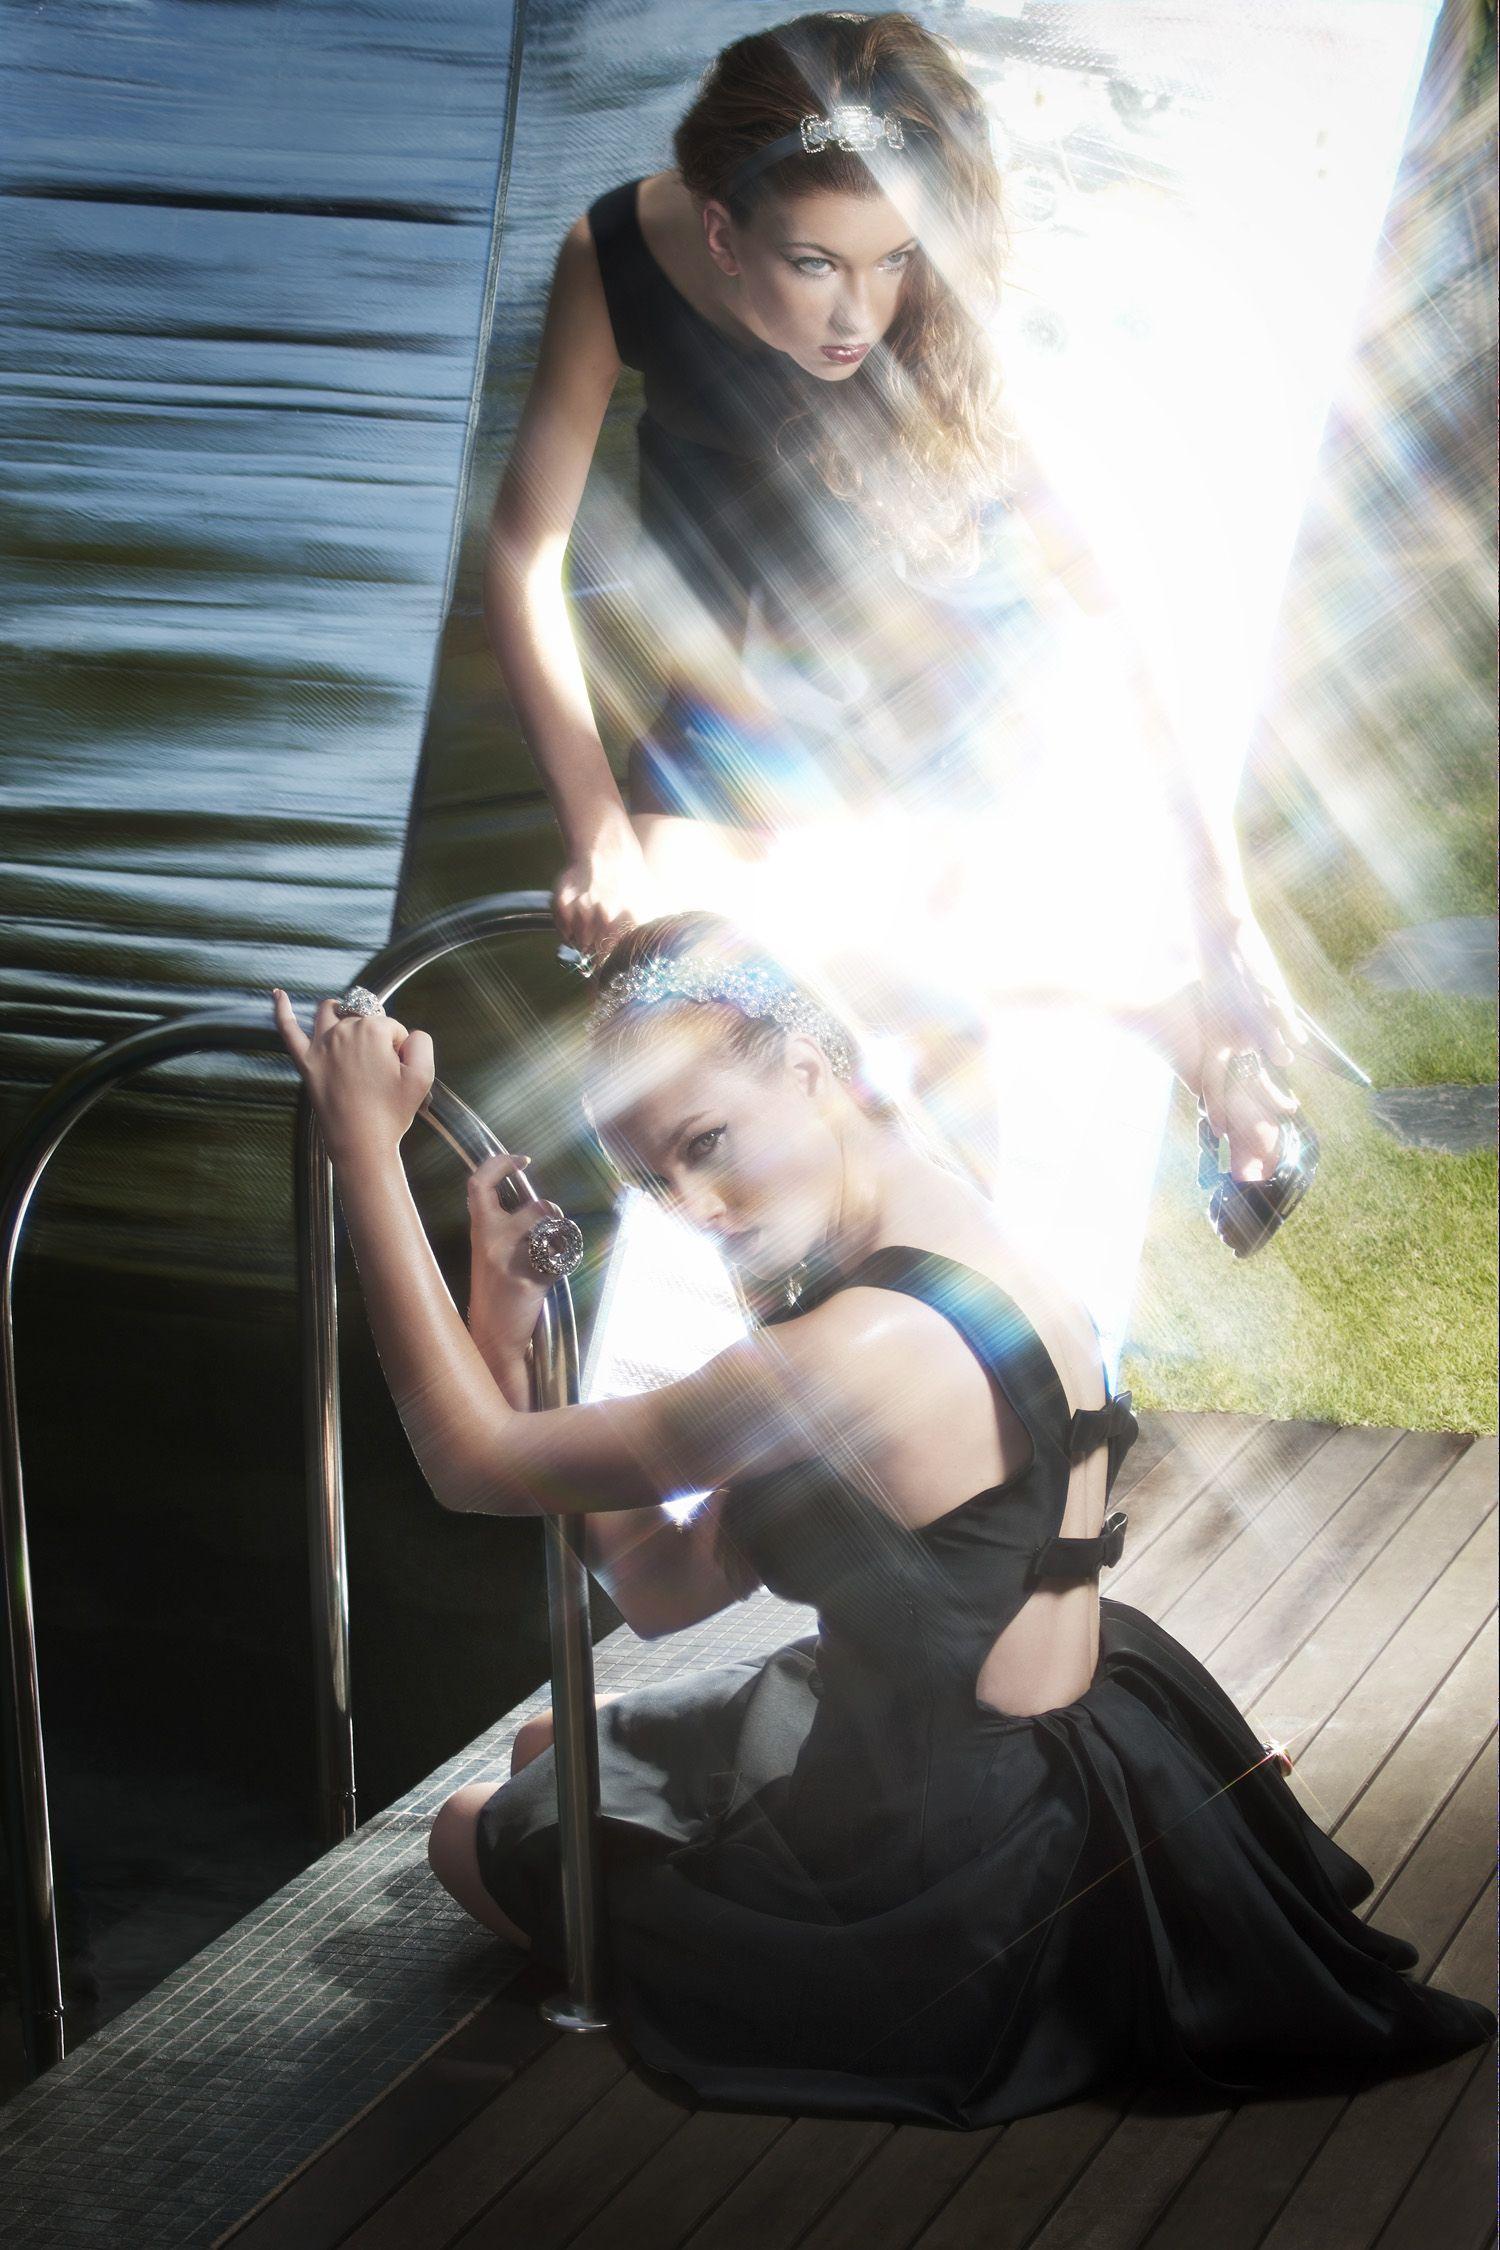 #Art #Photography #WaiTeik #Visionairs in Art #Salon_Vision Agency